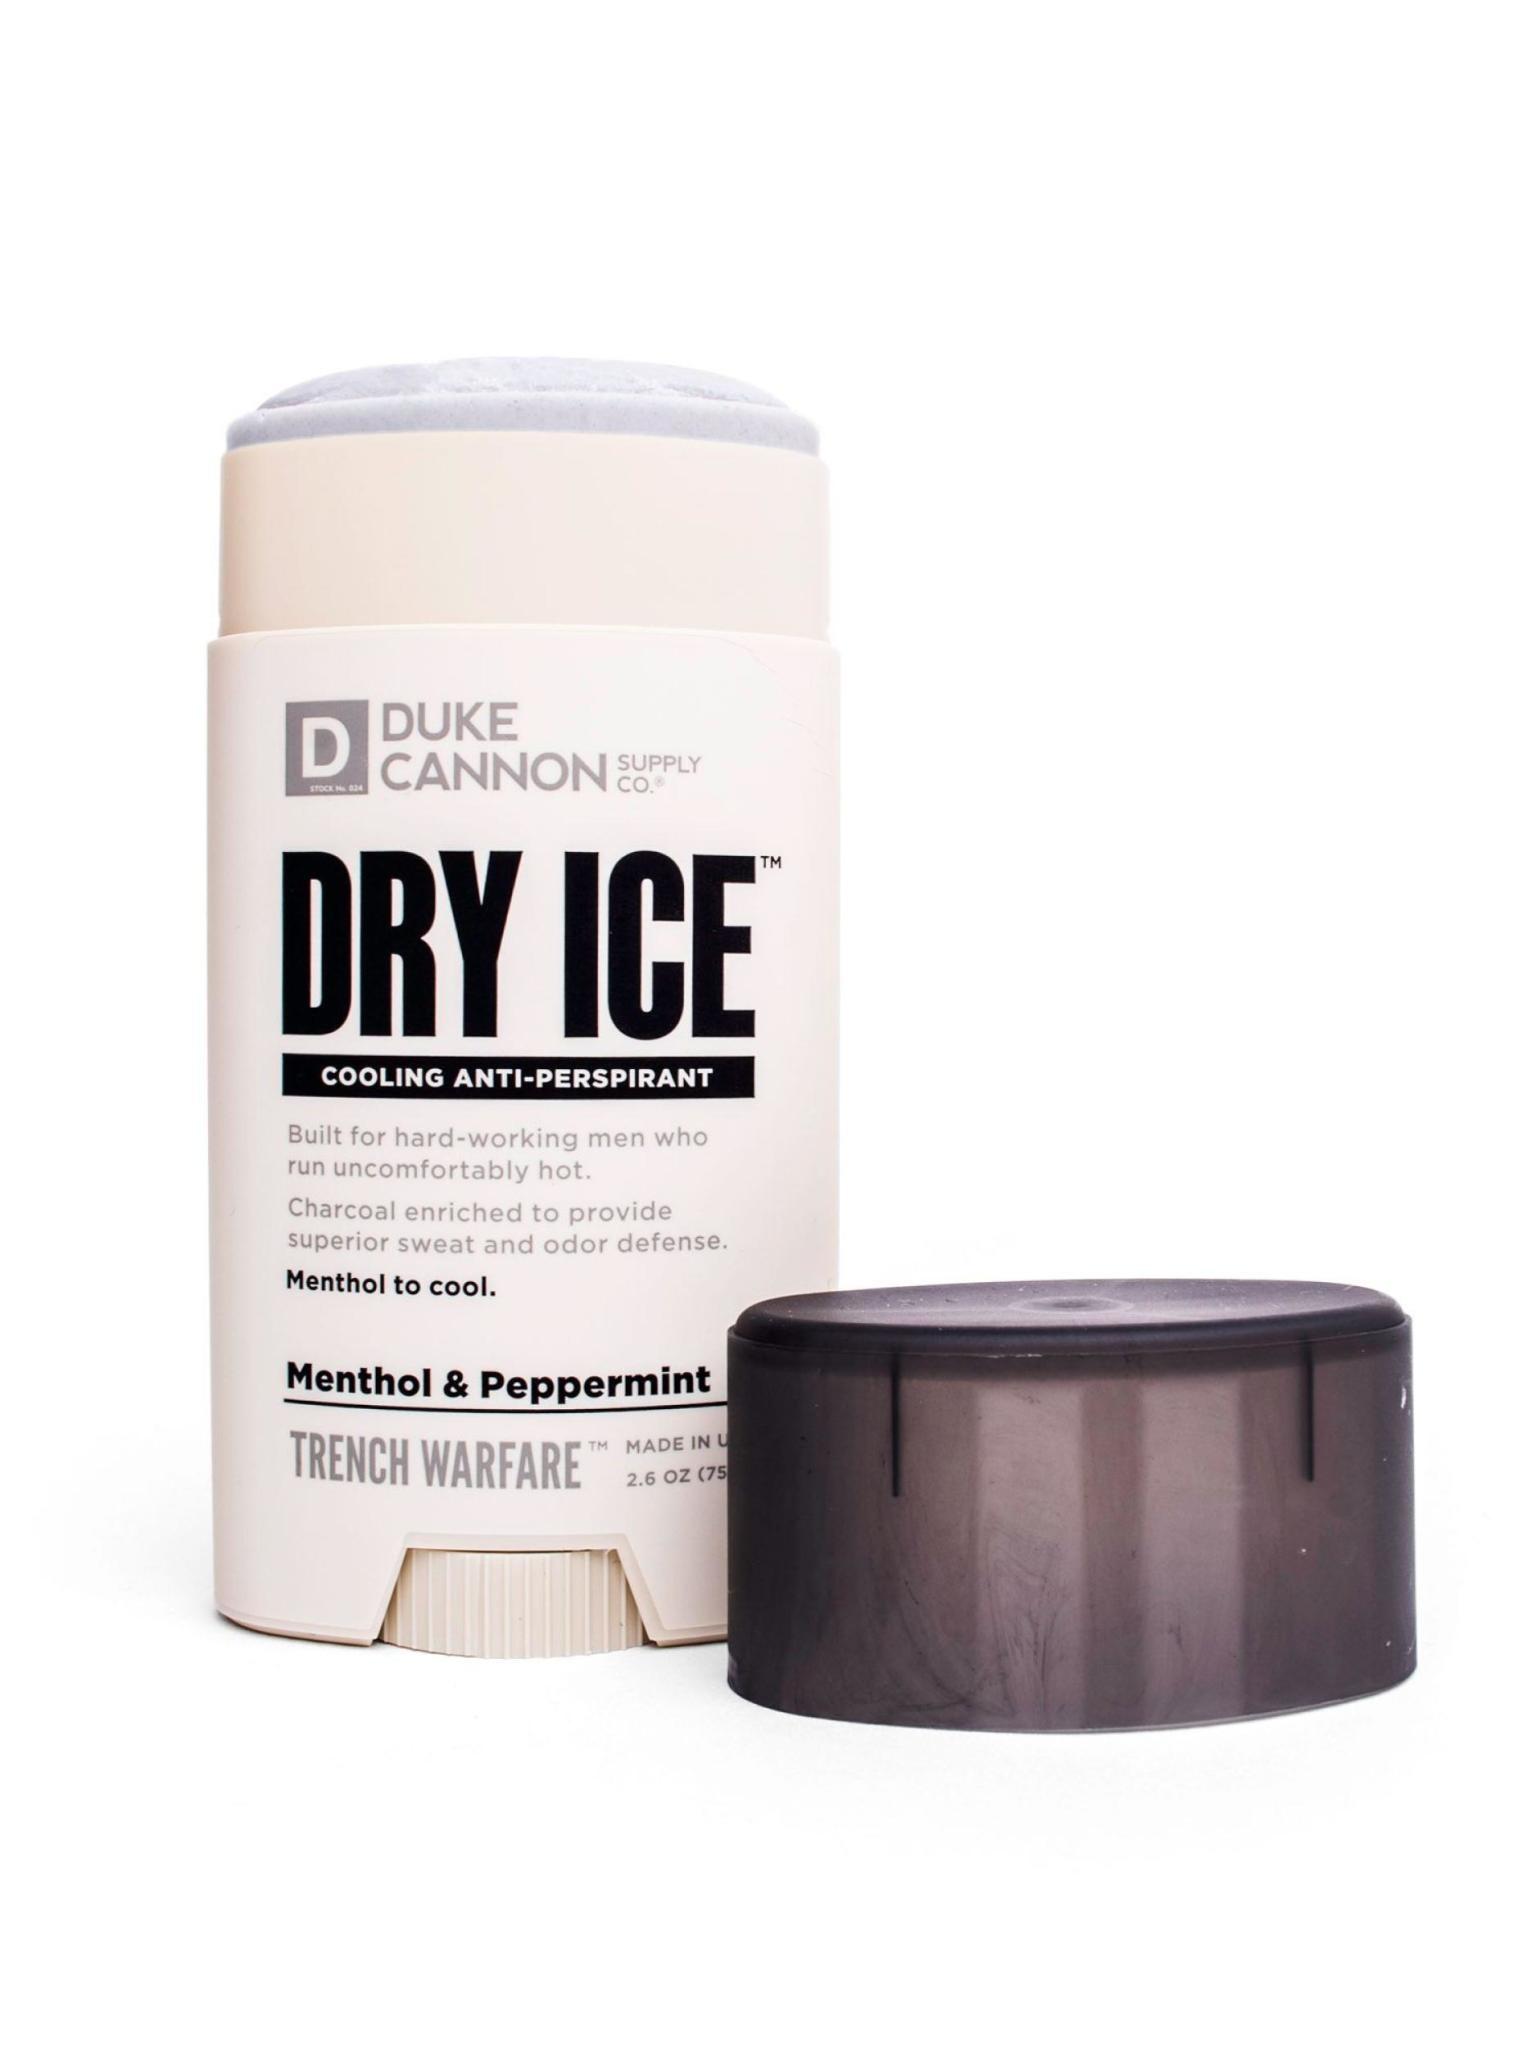 Duke Cannon Supply Co Dry Ice Antiperspirant Deodorant Menthol & Peppermint